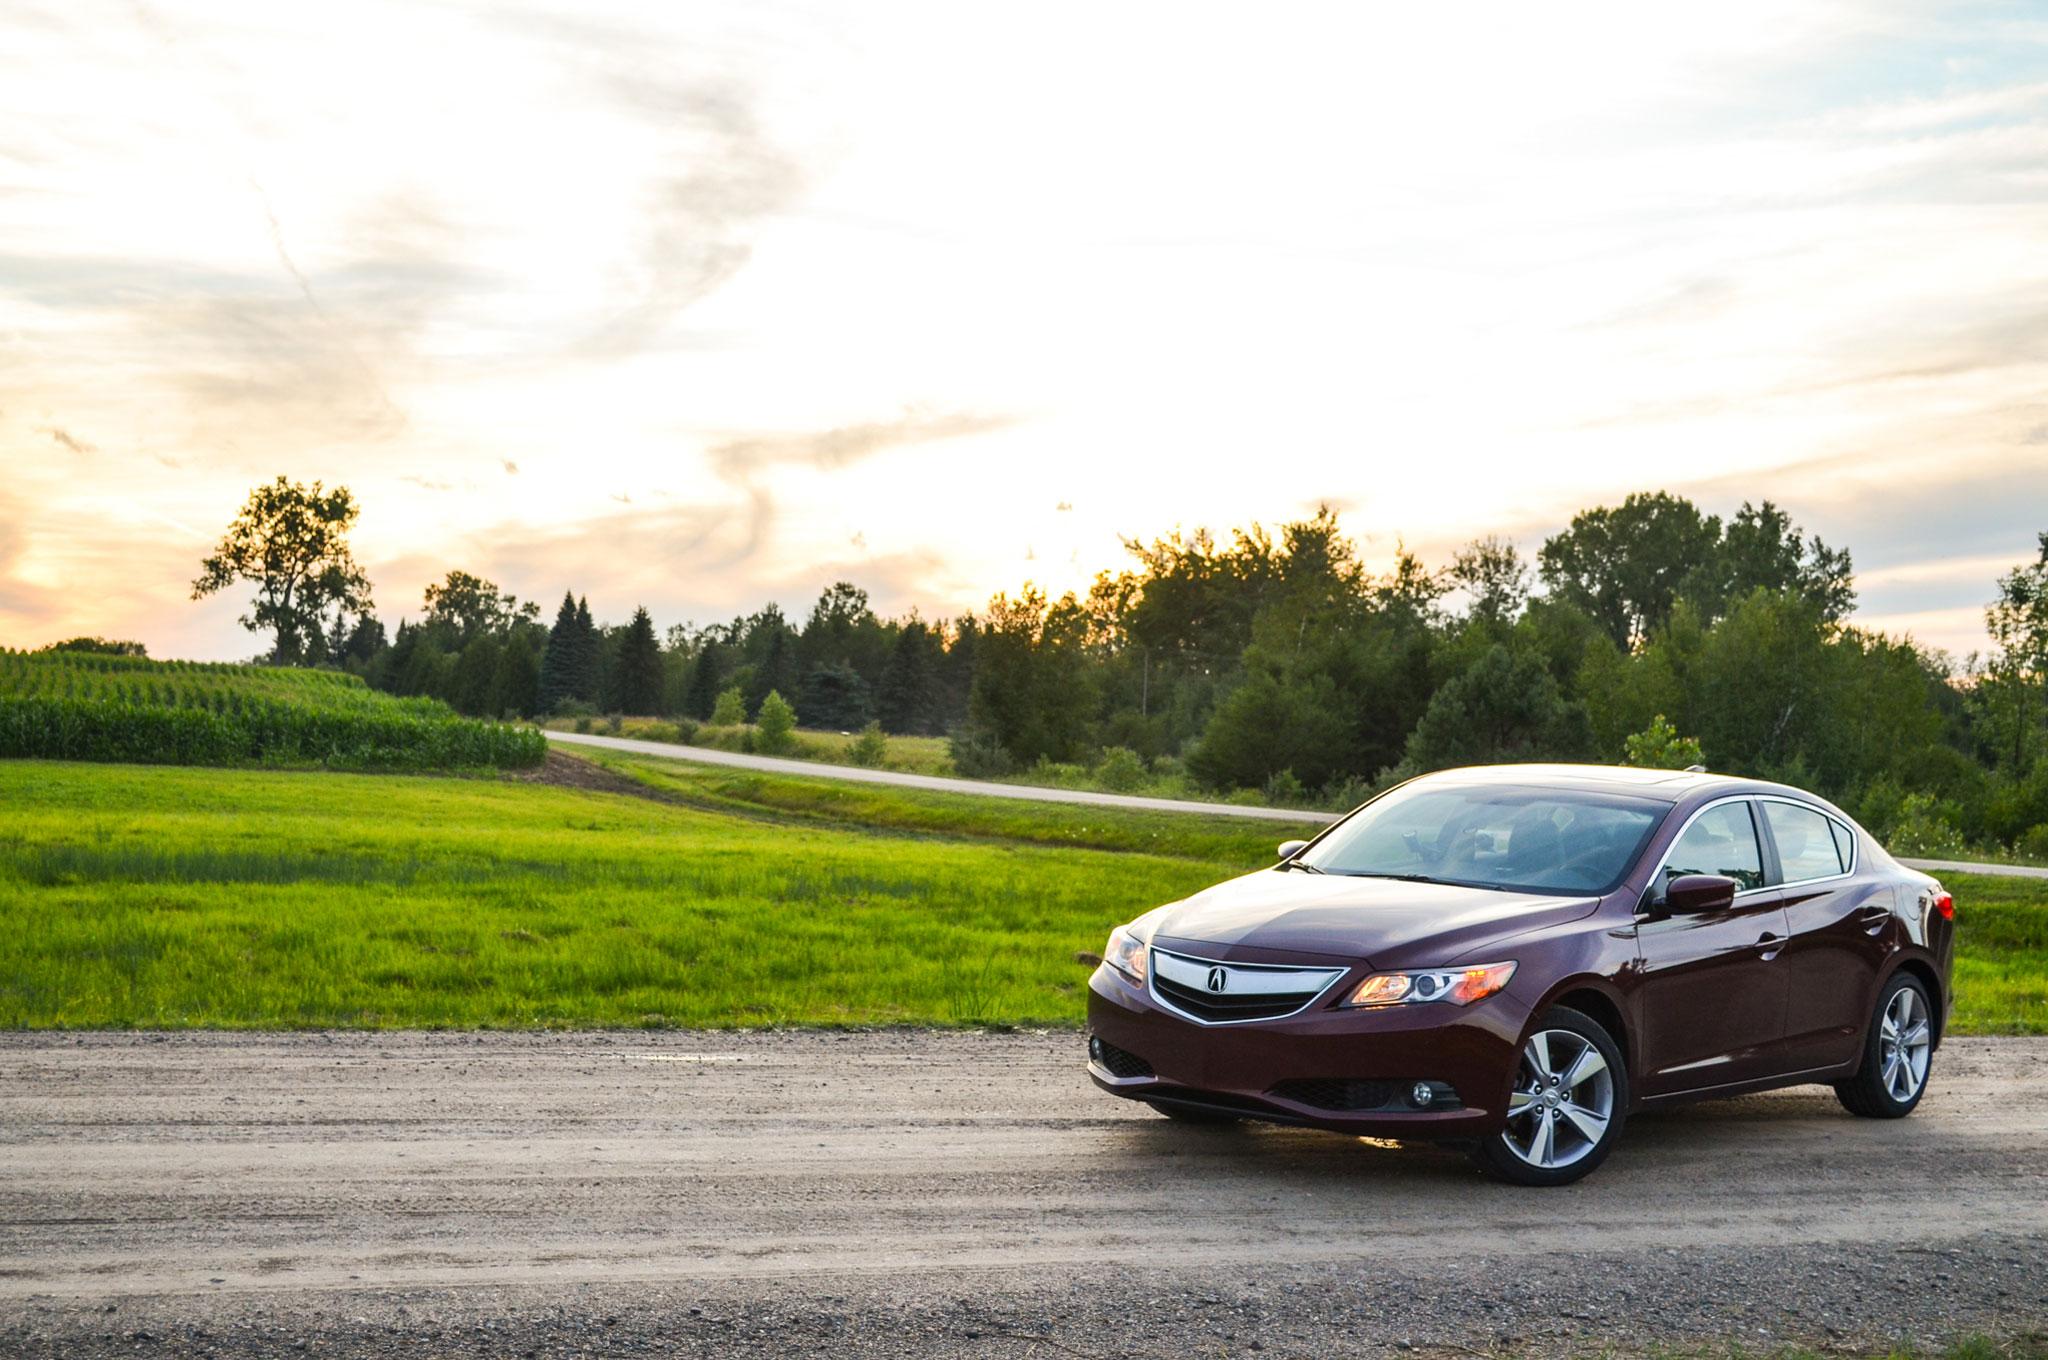 2013 Acura ILX Front Left View1